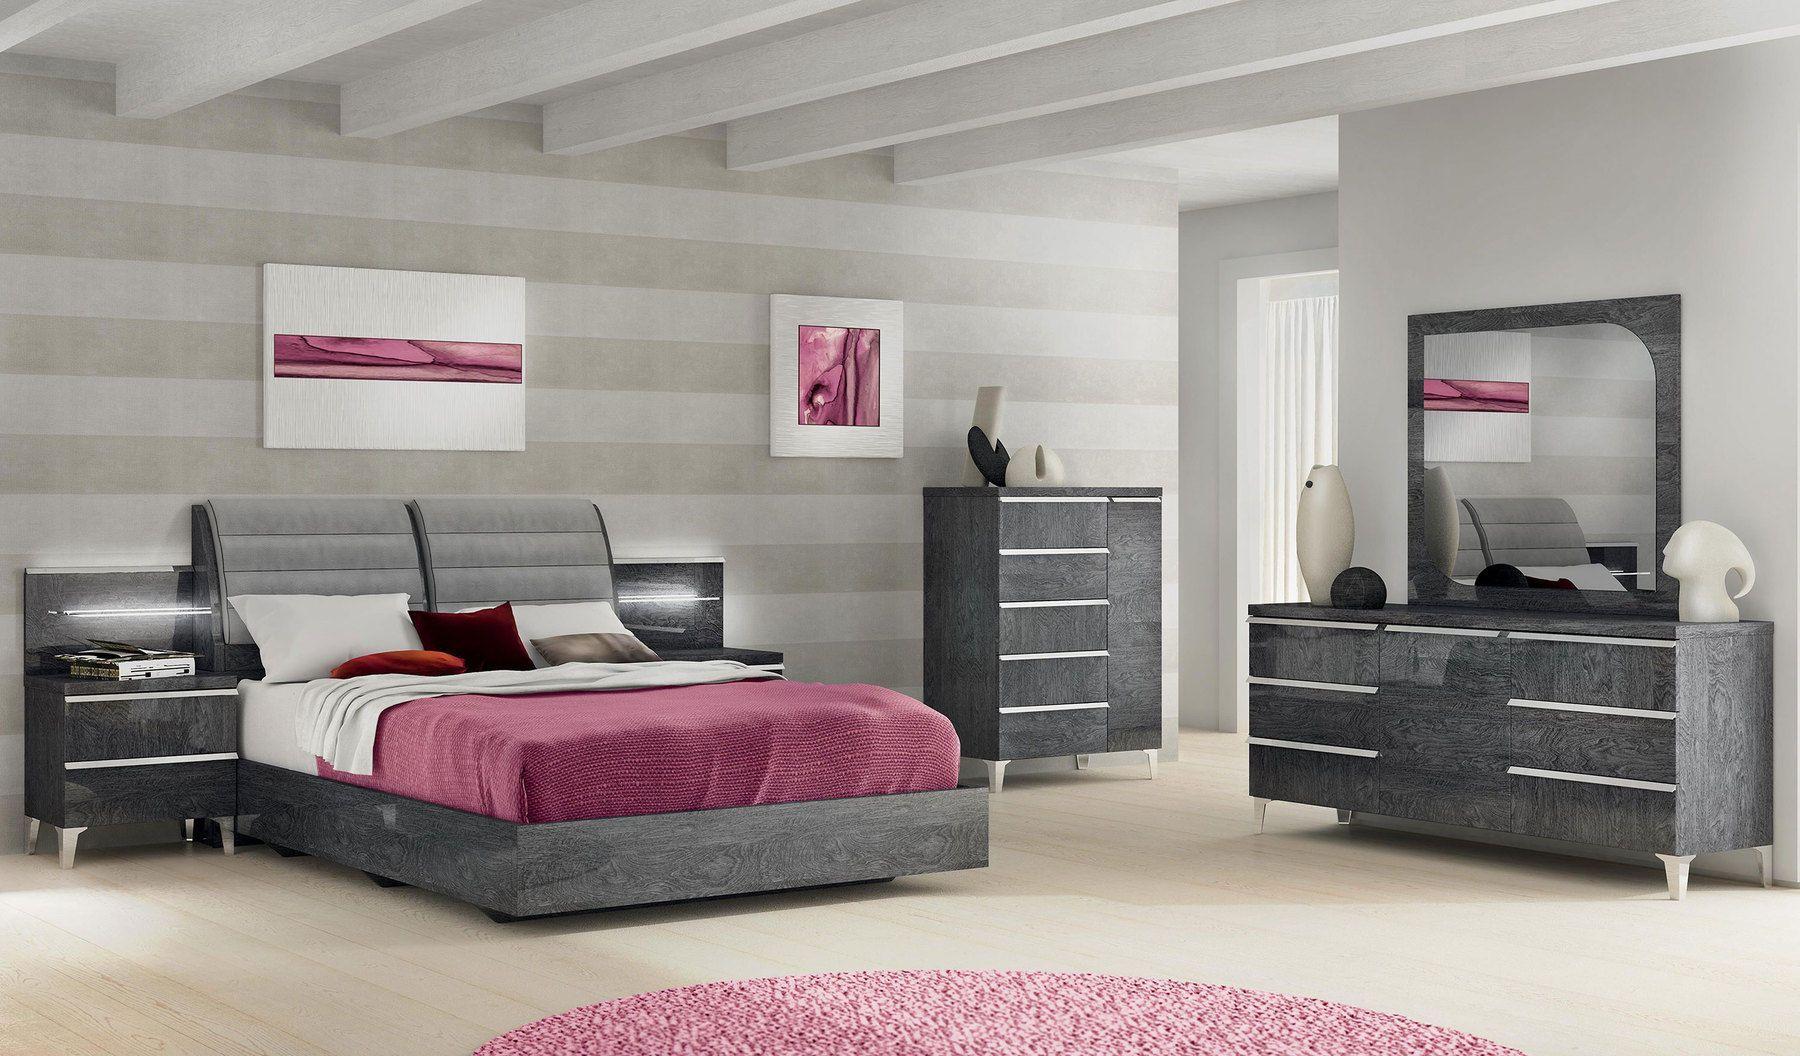 Esf Elite Grey Lack Modern Platform Bett Hergestellt In Italien Modern Bett Italien